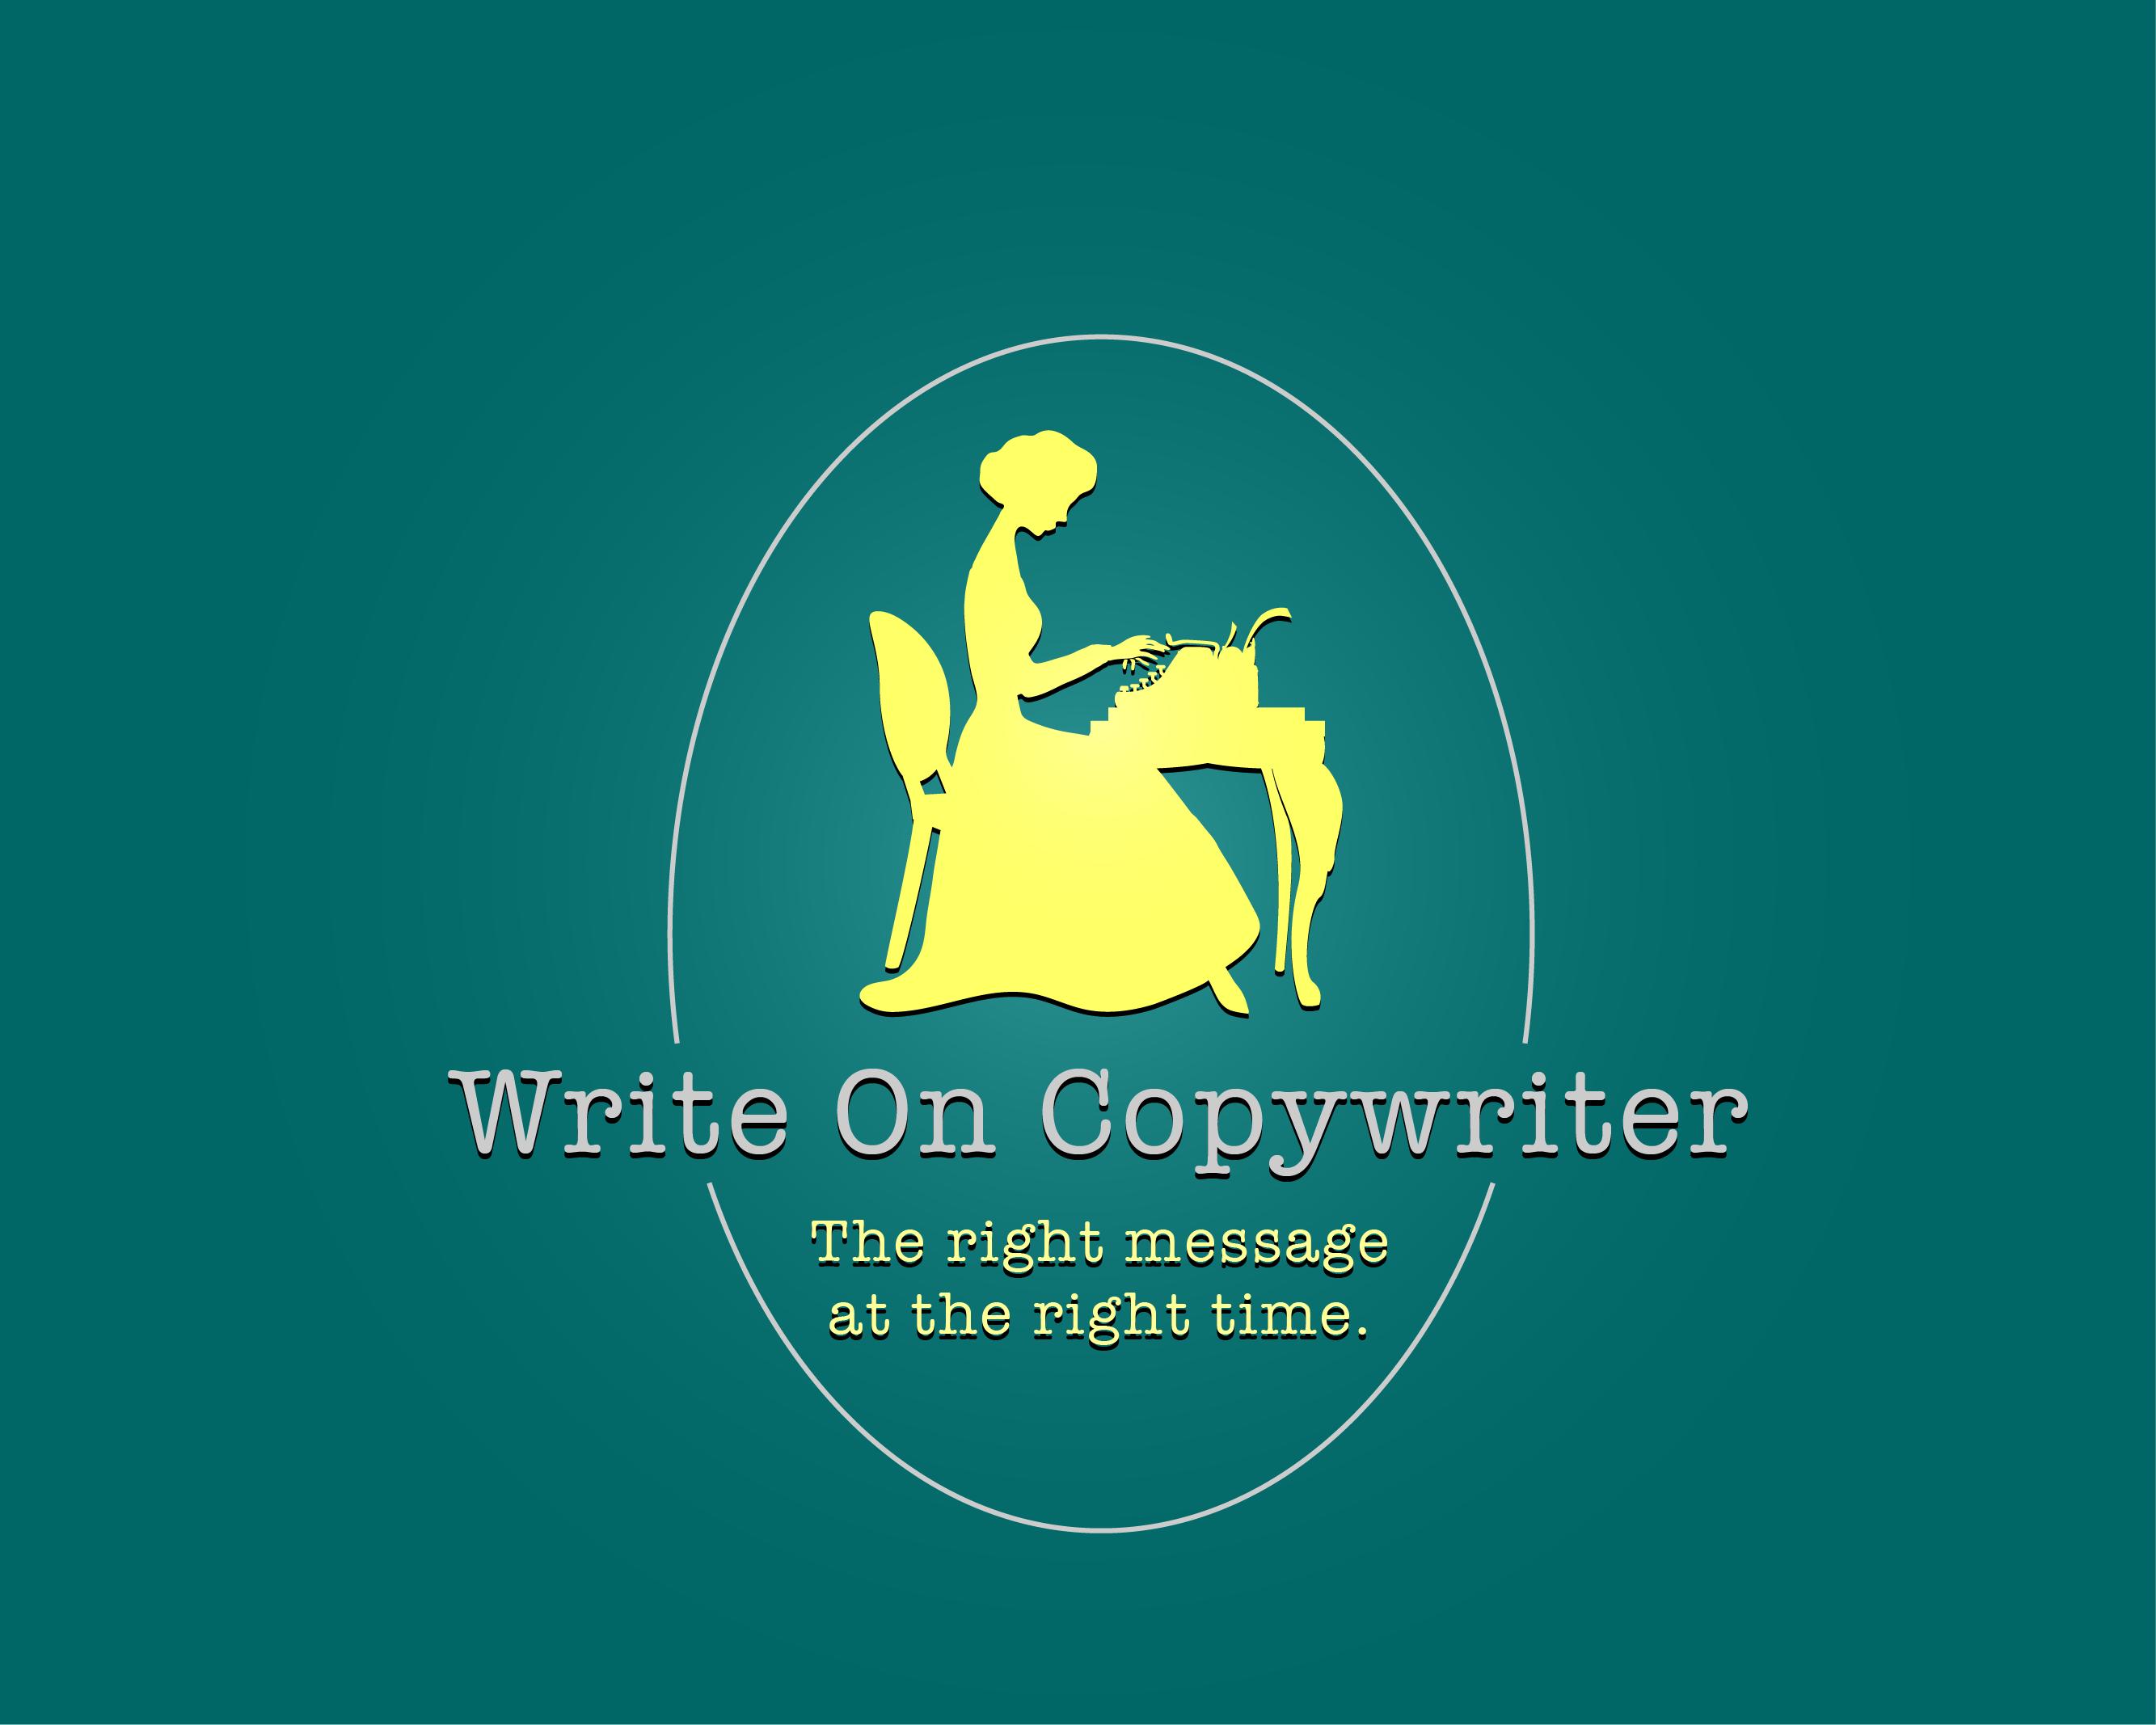 Write on Copywriter LLC